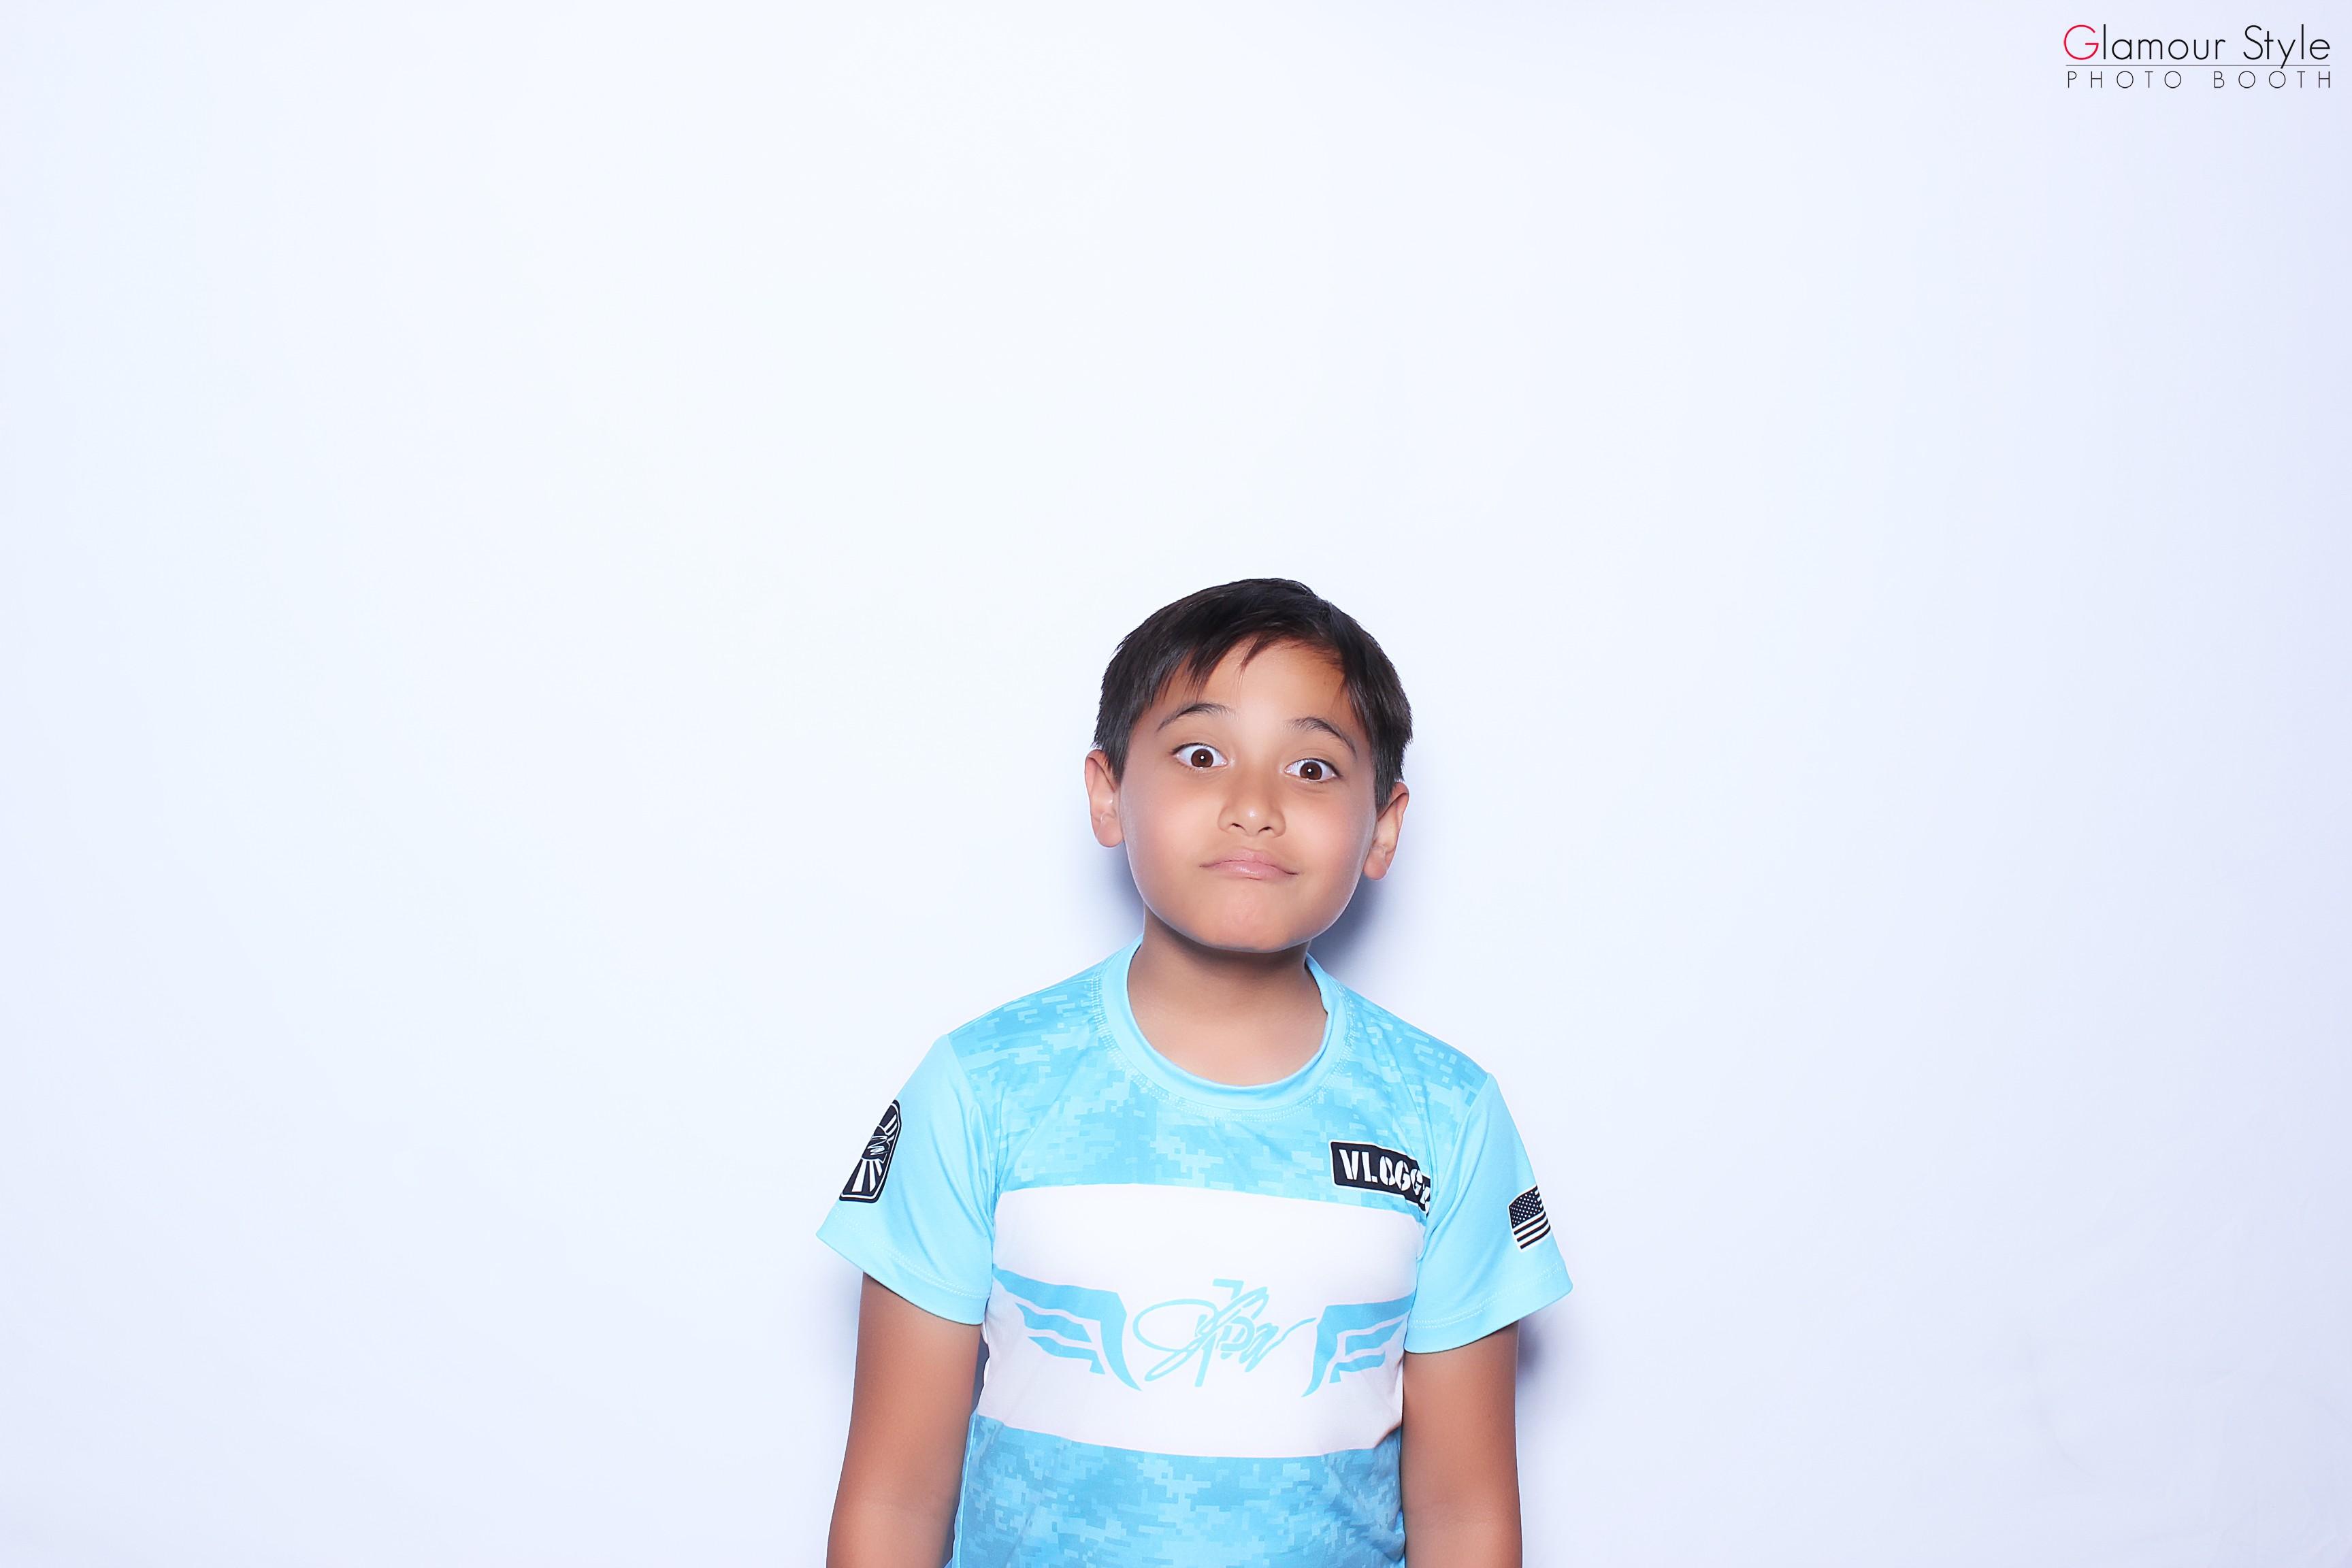 GSPB_0292